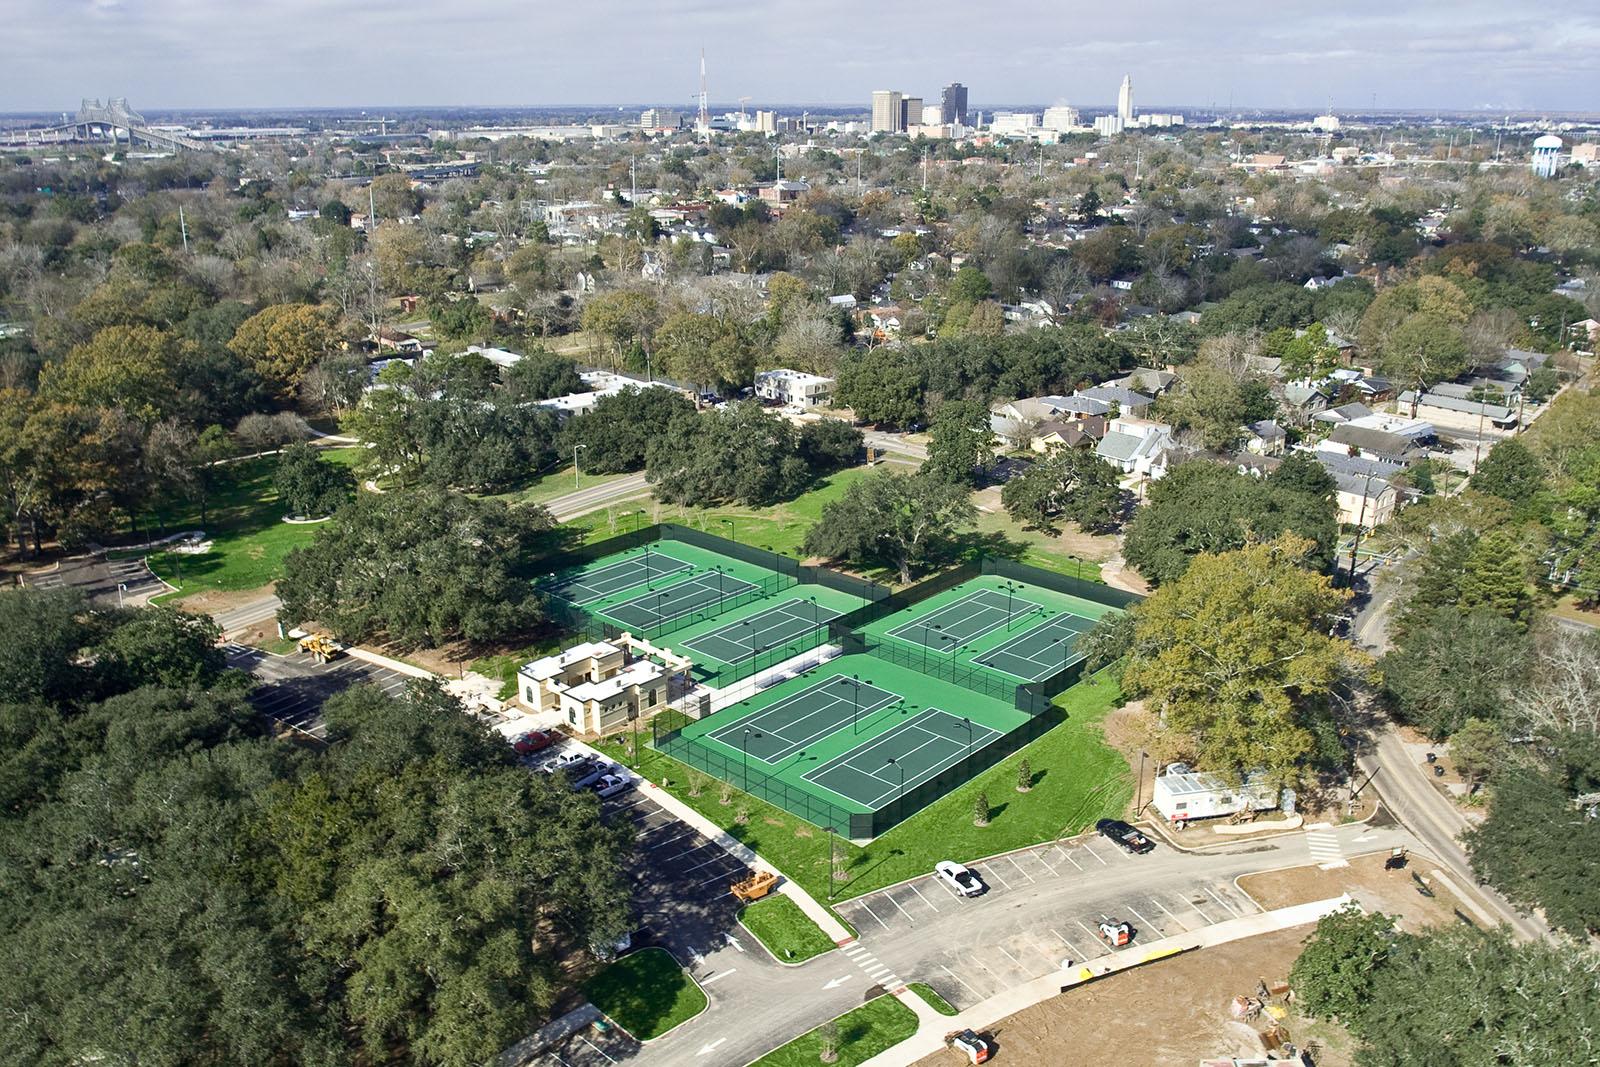 BR City Park aerial tennis